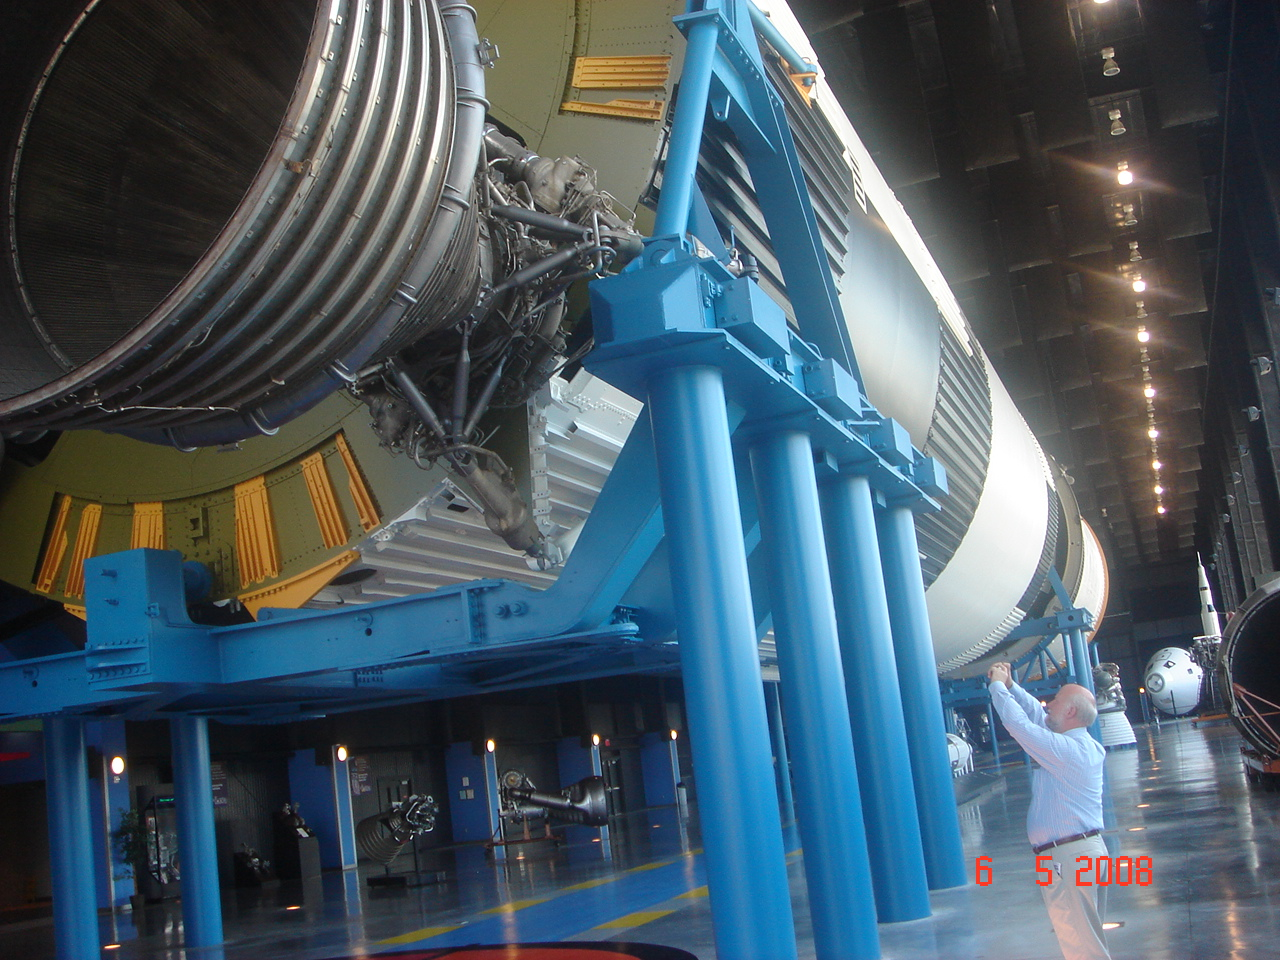 SaturnV Apollo Vehicle at Huntsville,USA